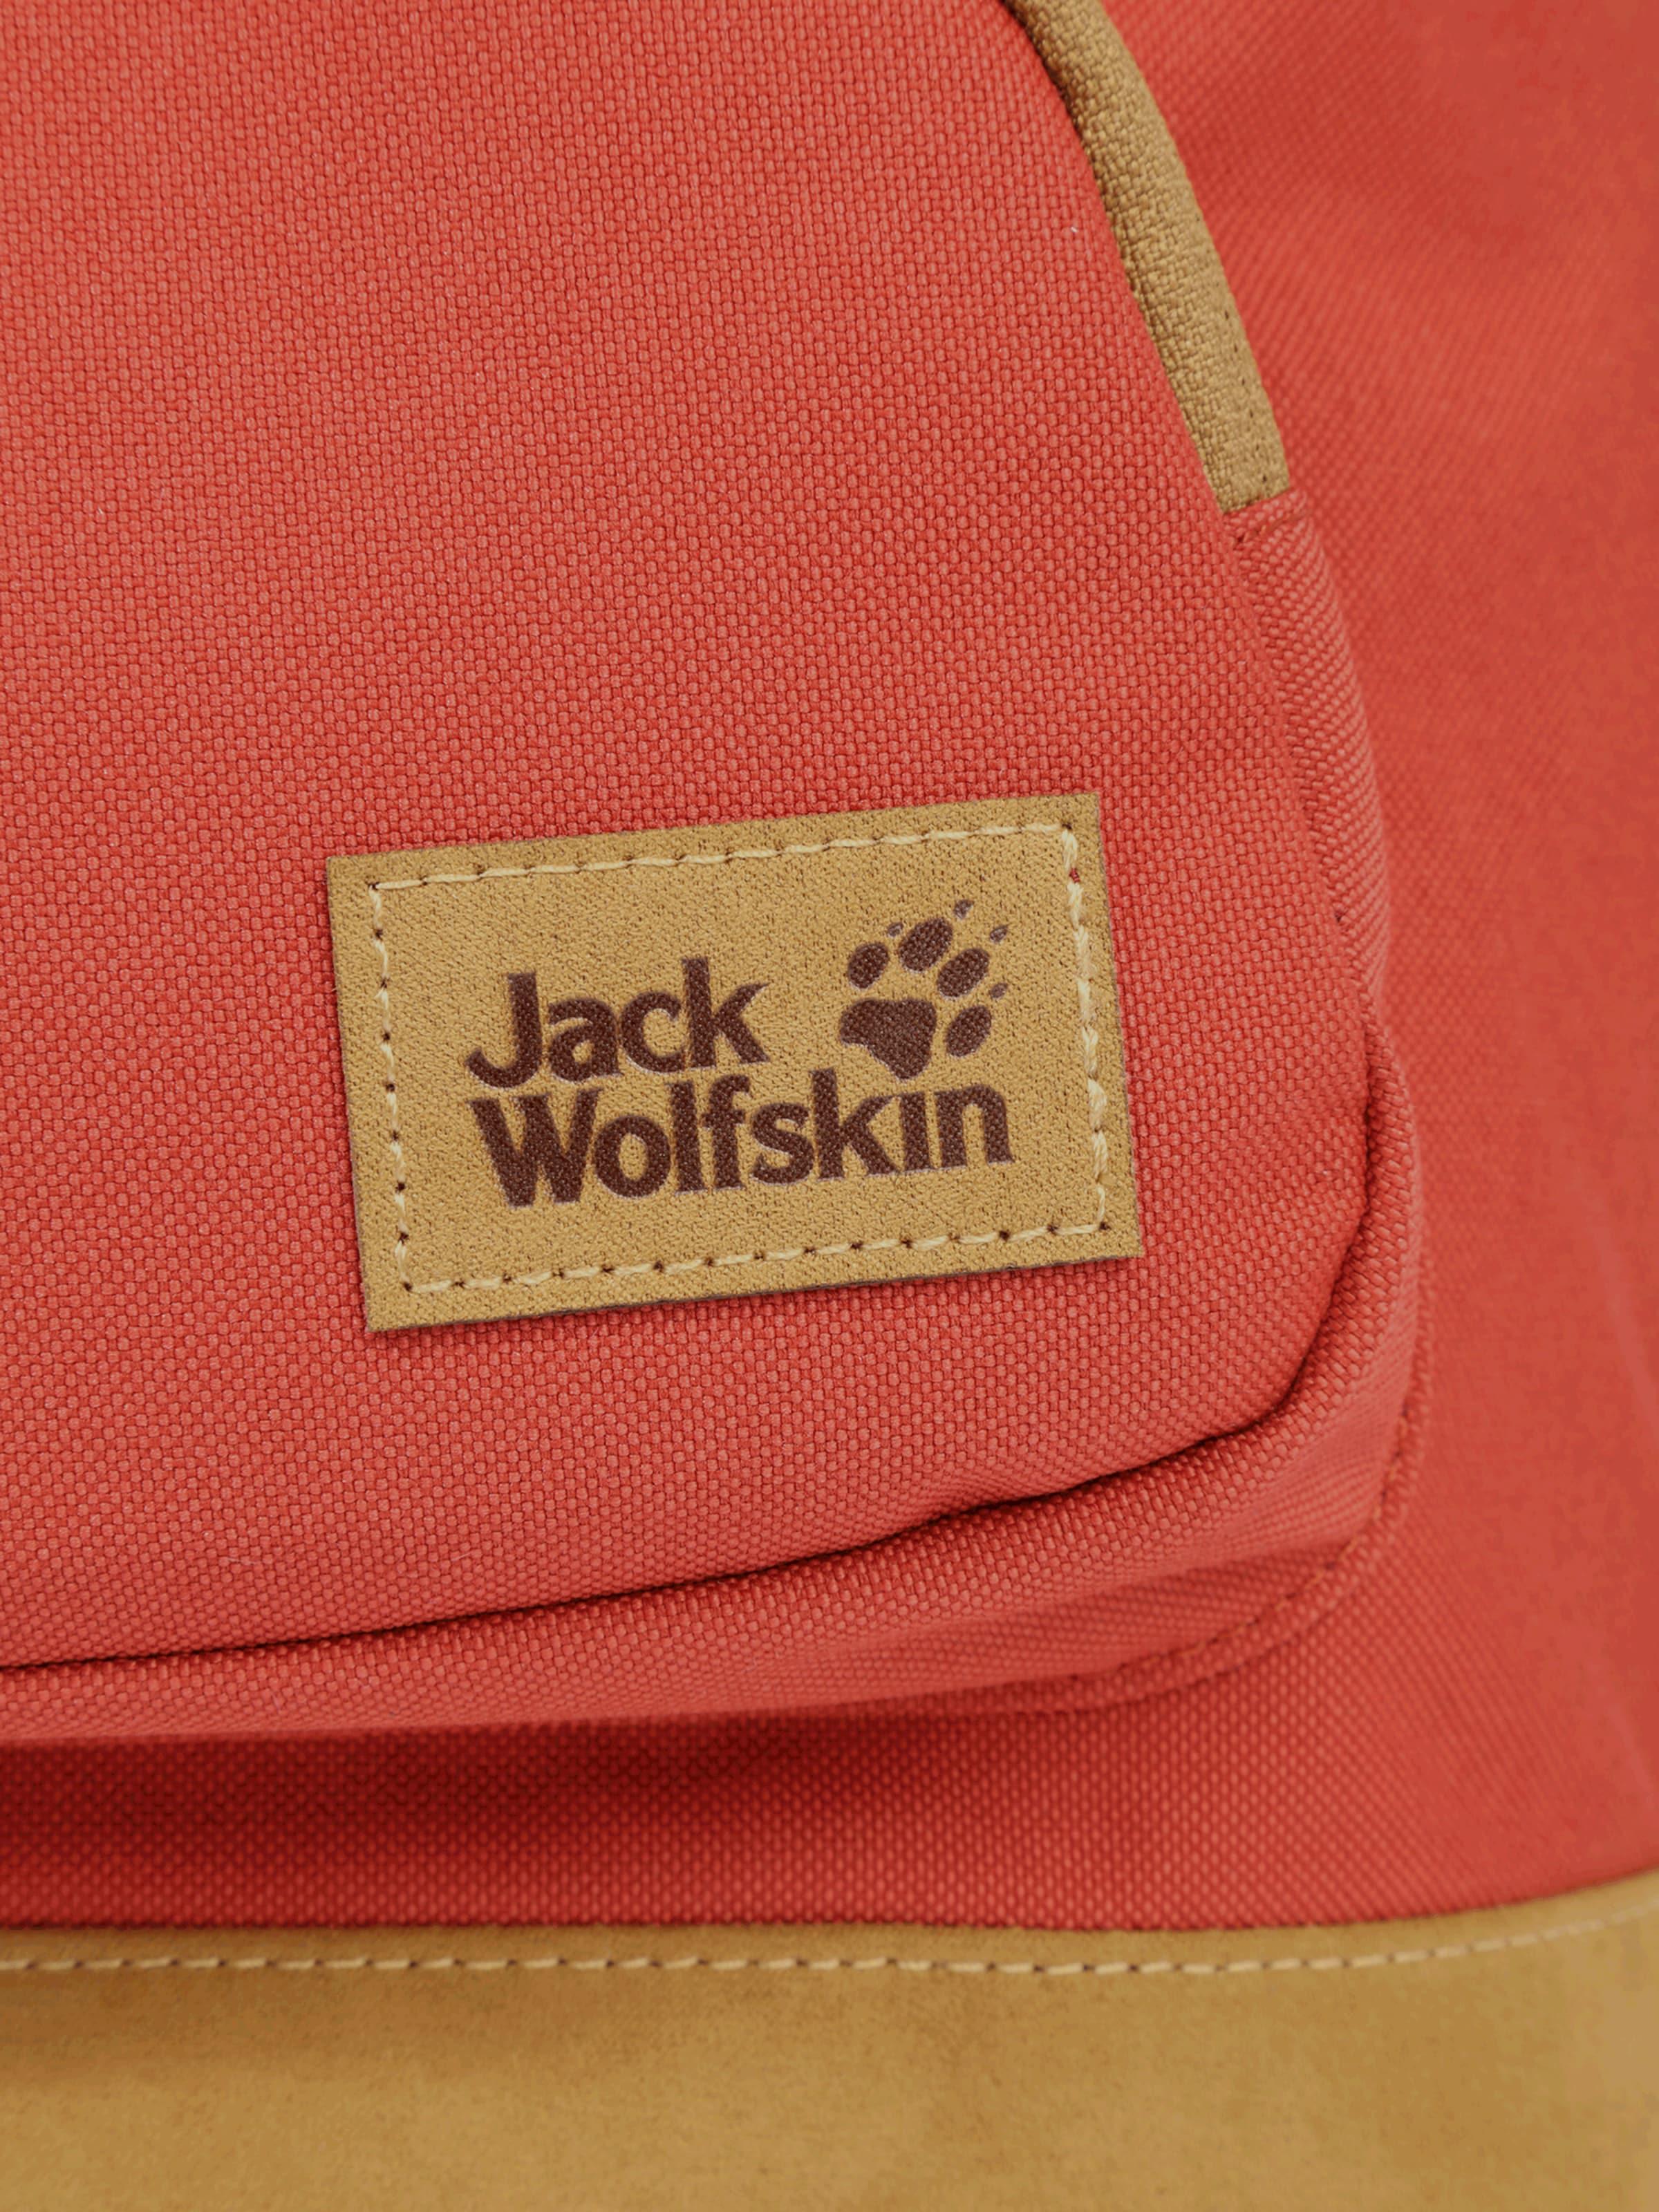 ACRE' Sportrucksack JACK Sportrucksack WOLFSKIN JACK WOLFSKIN 'LONG ACRE' 'LONG ACRE' WOLFSKIN 'LONG JACK Sportrucksack JACK 547q4Rw